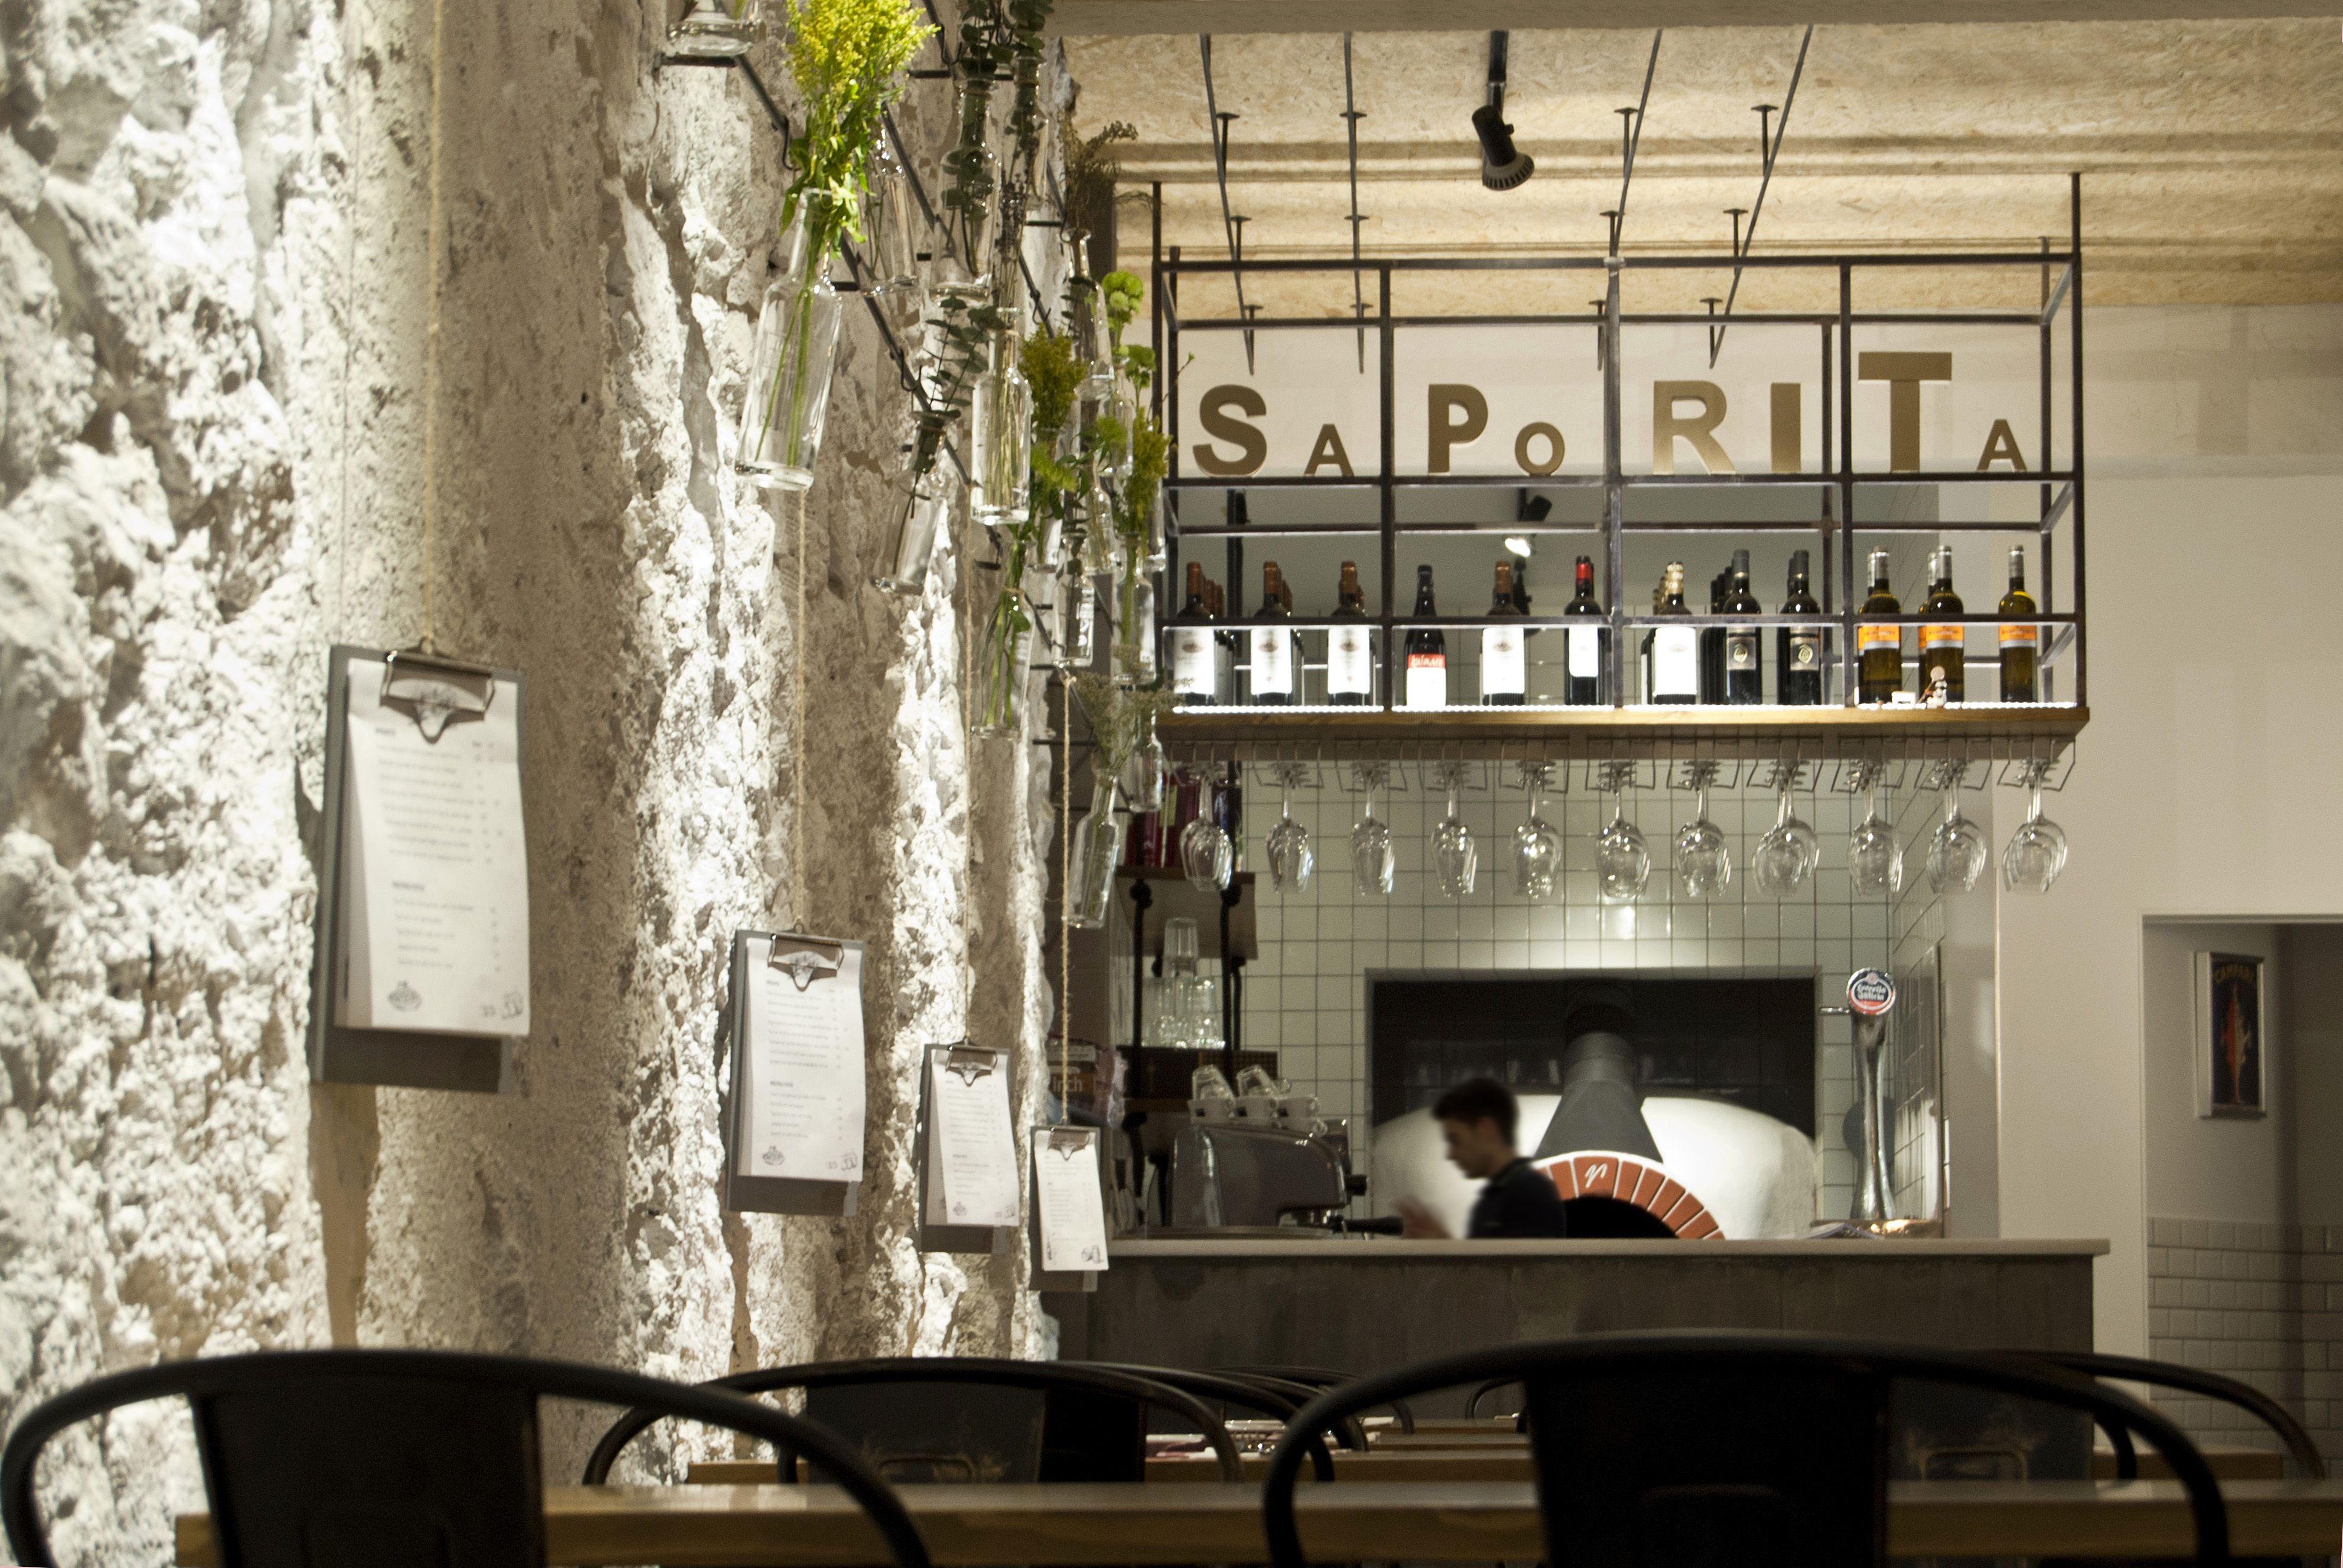 Pizzeria La Saporita_ Dise O De Interiorismo Y Mobiliario Por Mas  # Muebles Pizzeria